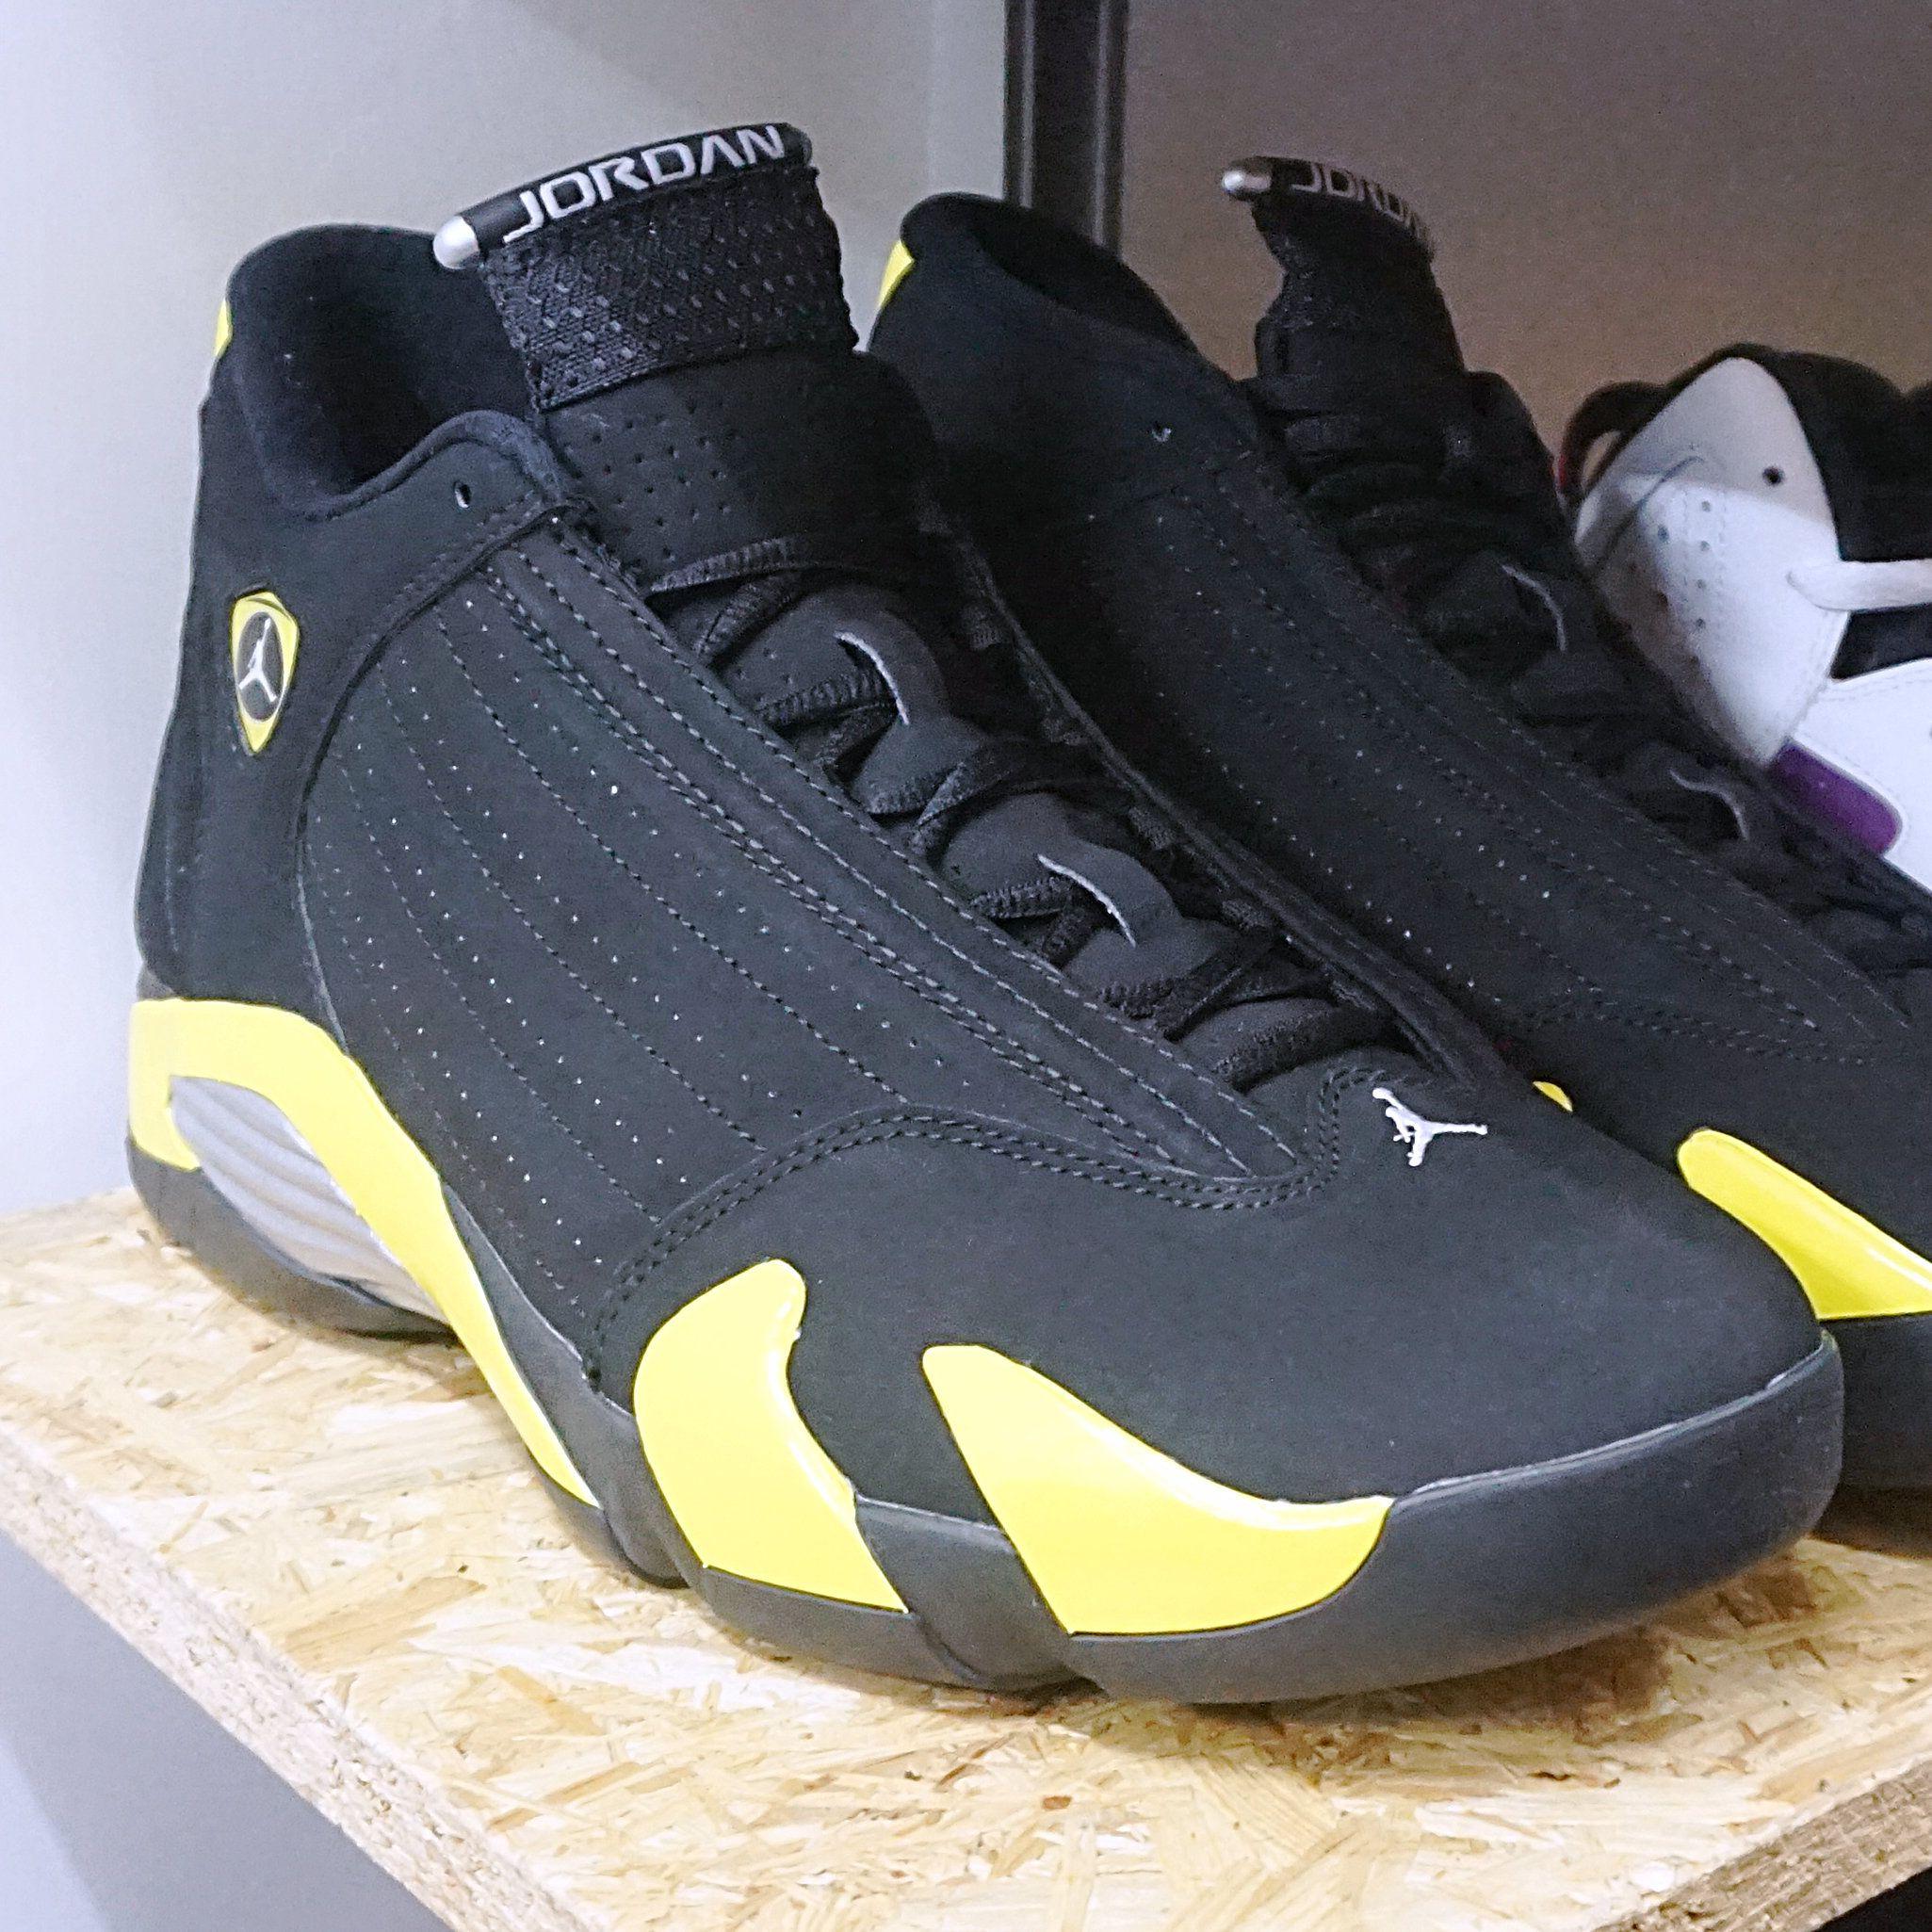 Nike Air Jordan 14 Retro Thunder (487471-070) https://www